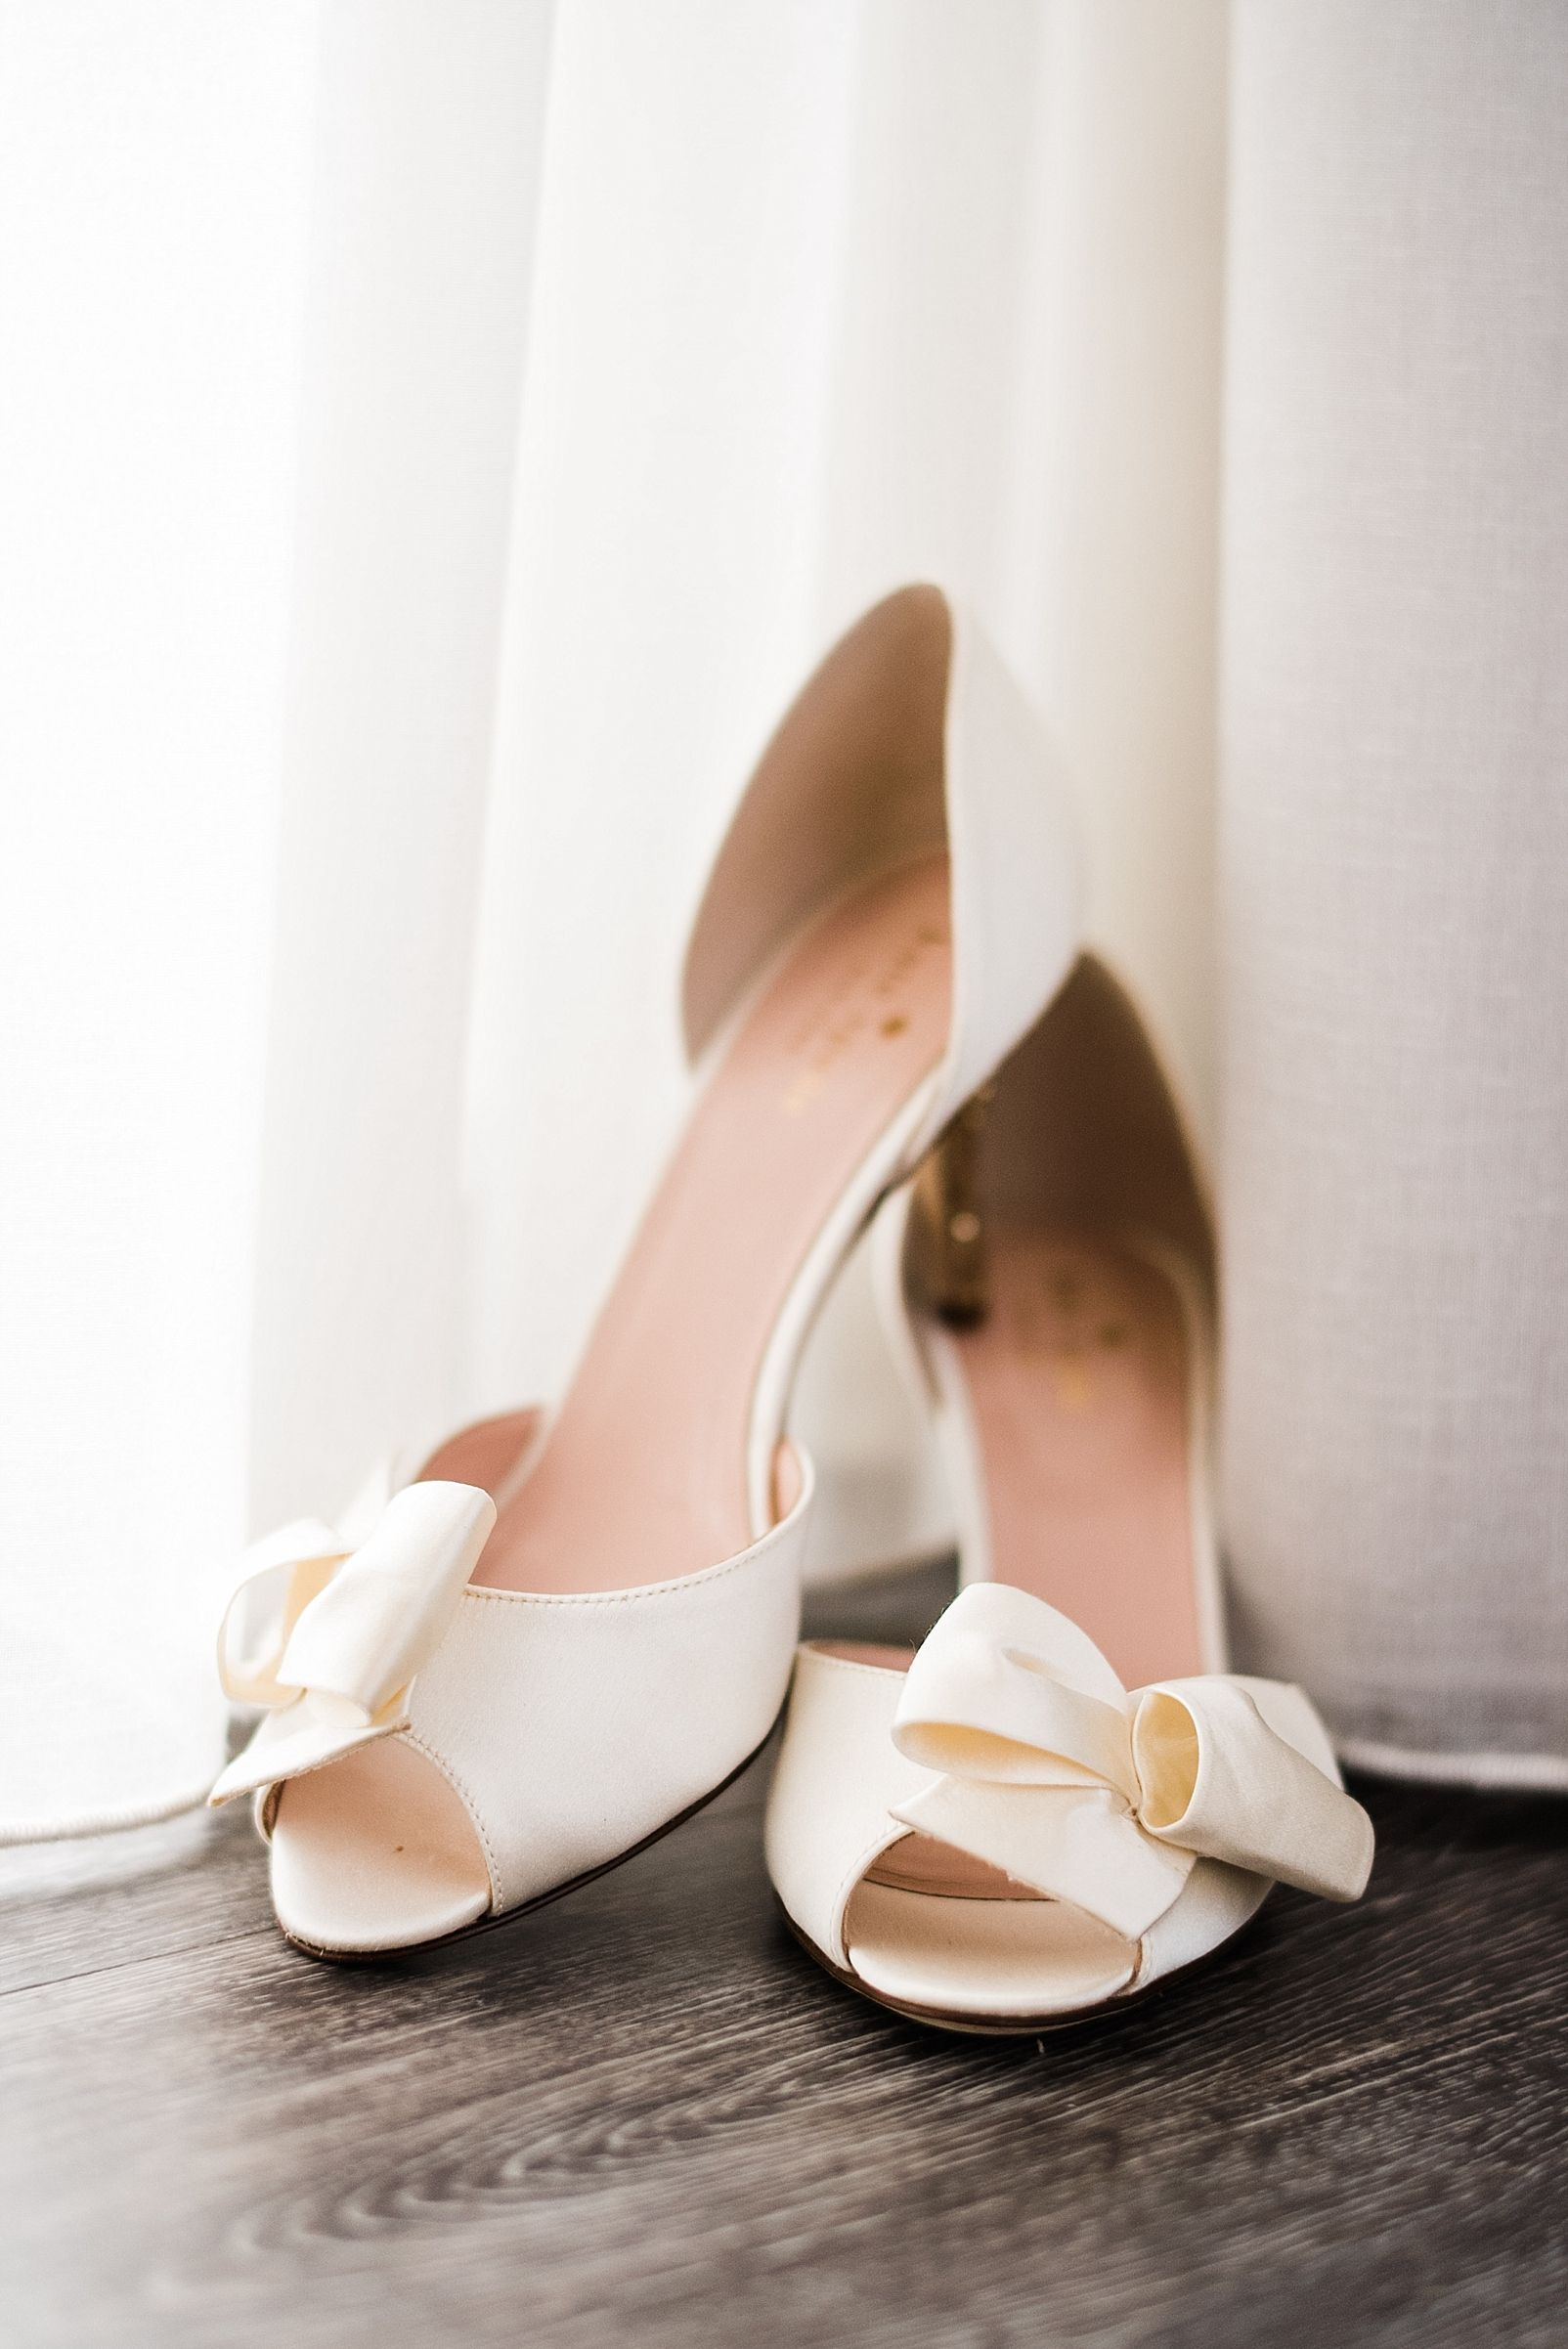 70133378649 raleigh wedding photographer renaissance hotel north hills wedding kate  spade wedding shoes classic wedding photo